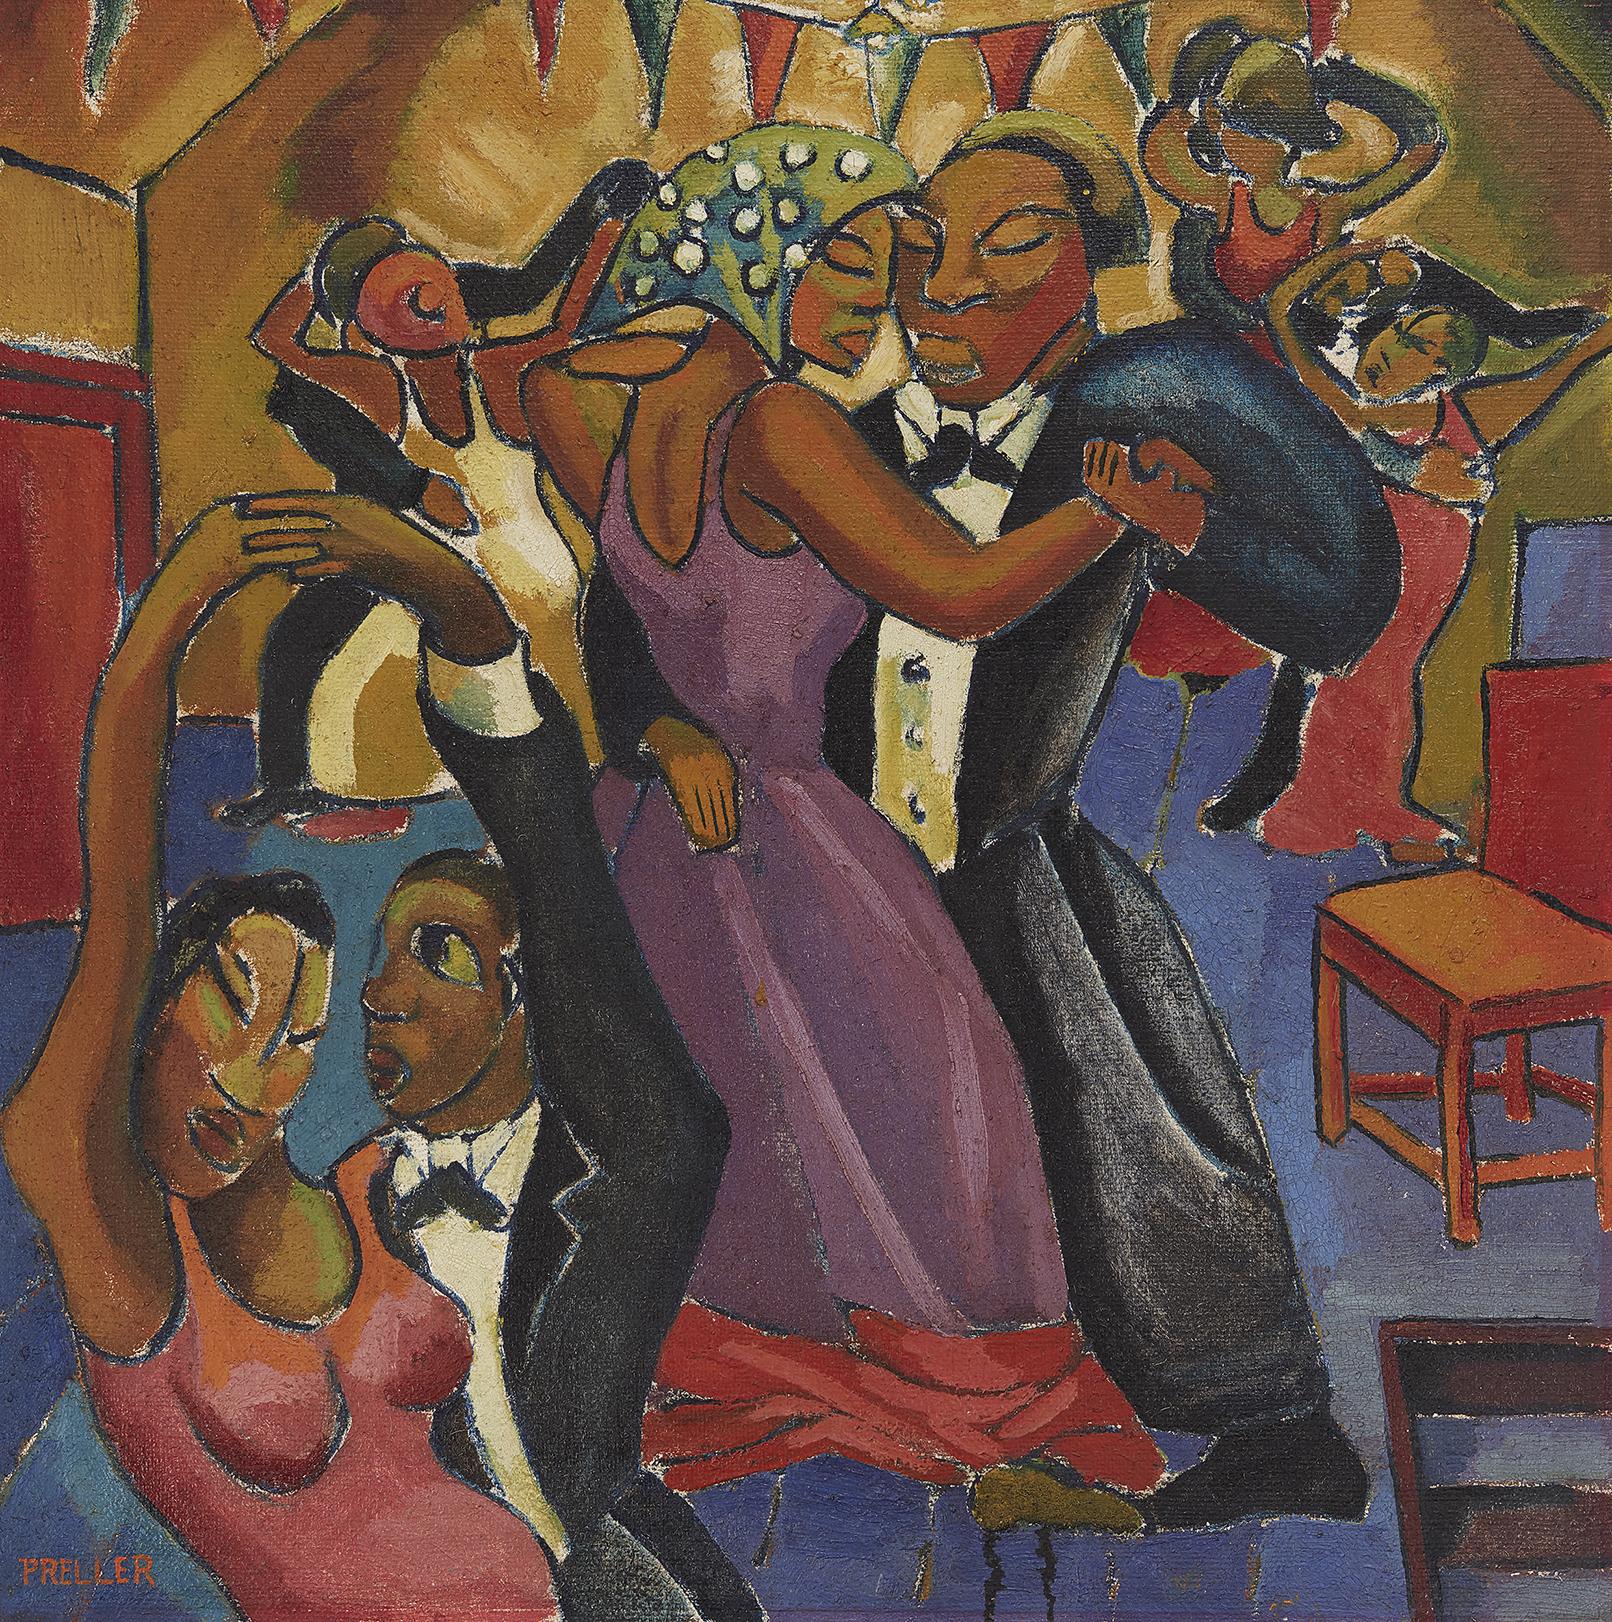 ALEXIS PRELLER (1911-1975) - The Dance, Öl/Sackleinen, signert, 1936 oder früher